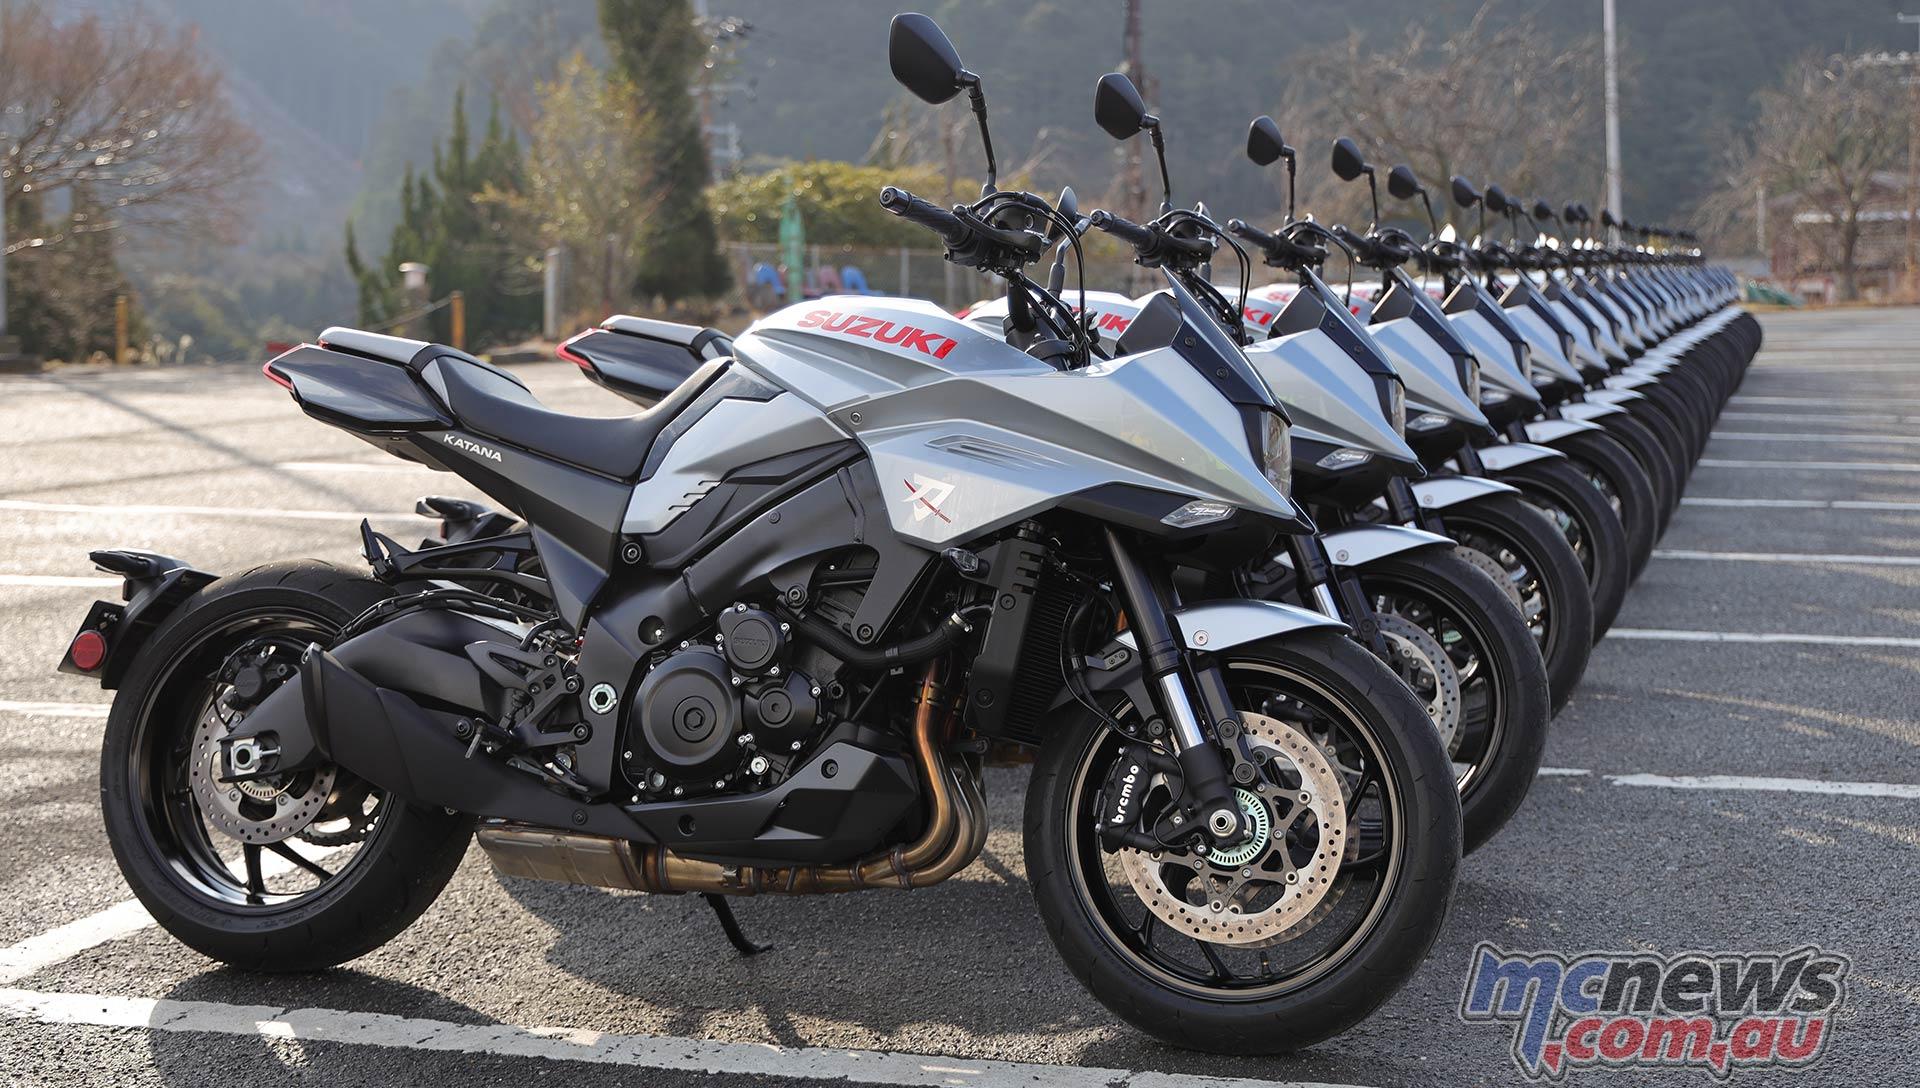 2020 suzuki katana review motorcycle tests mcnews com au suzuki b-king 2020  suzuki katana